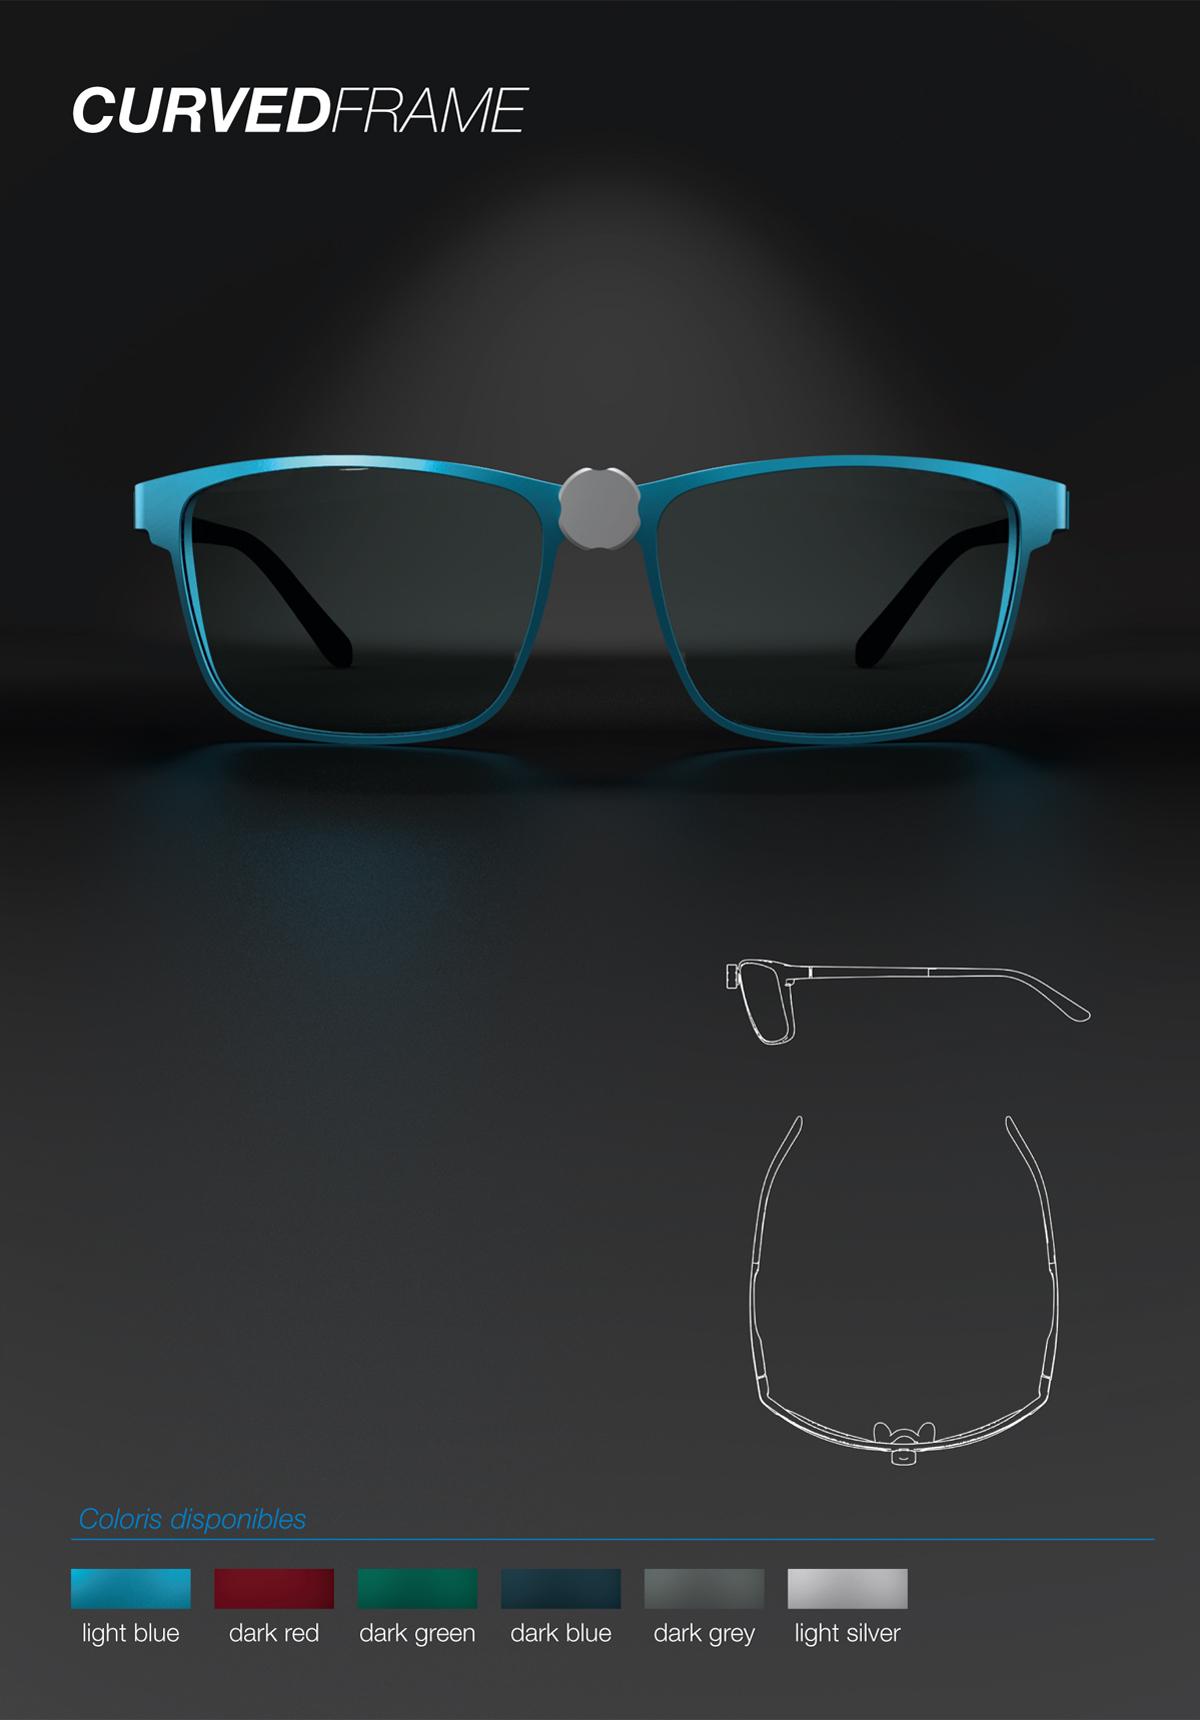 3MC-Concept - I.C.Lercher - Montures Curved Frame 2021 - Copyright I.C.LErcher